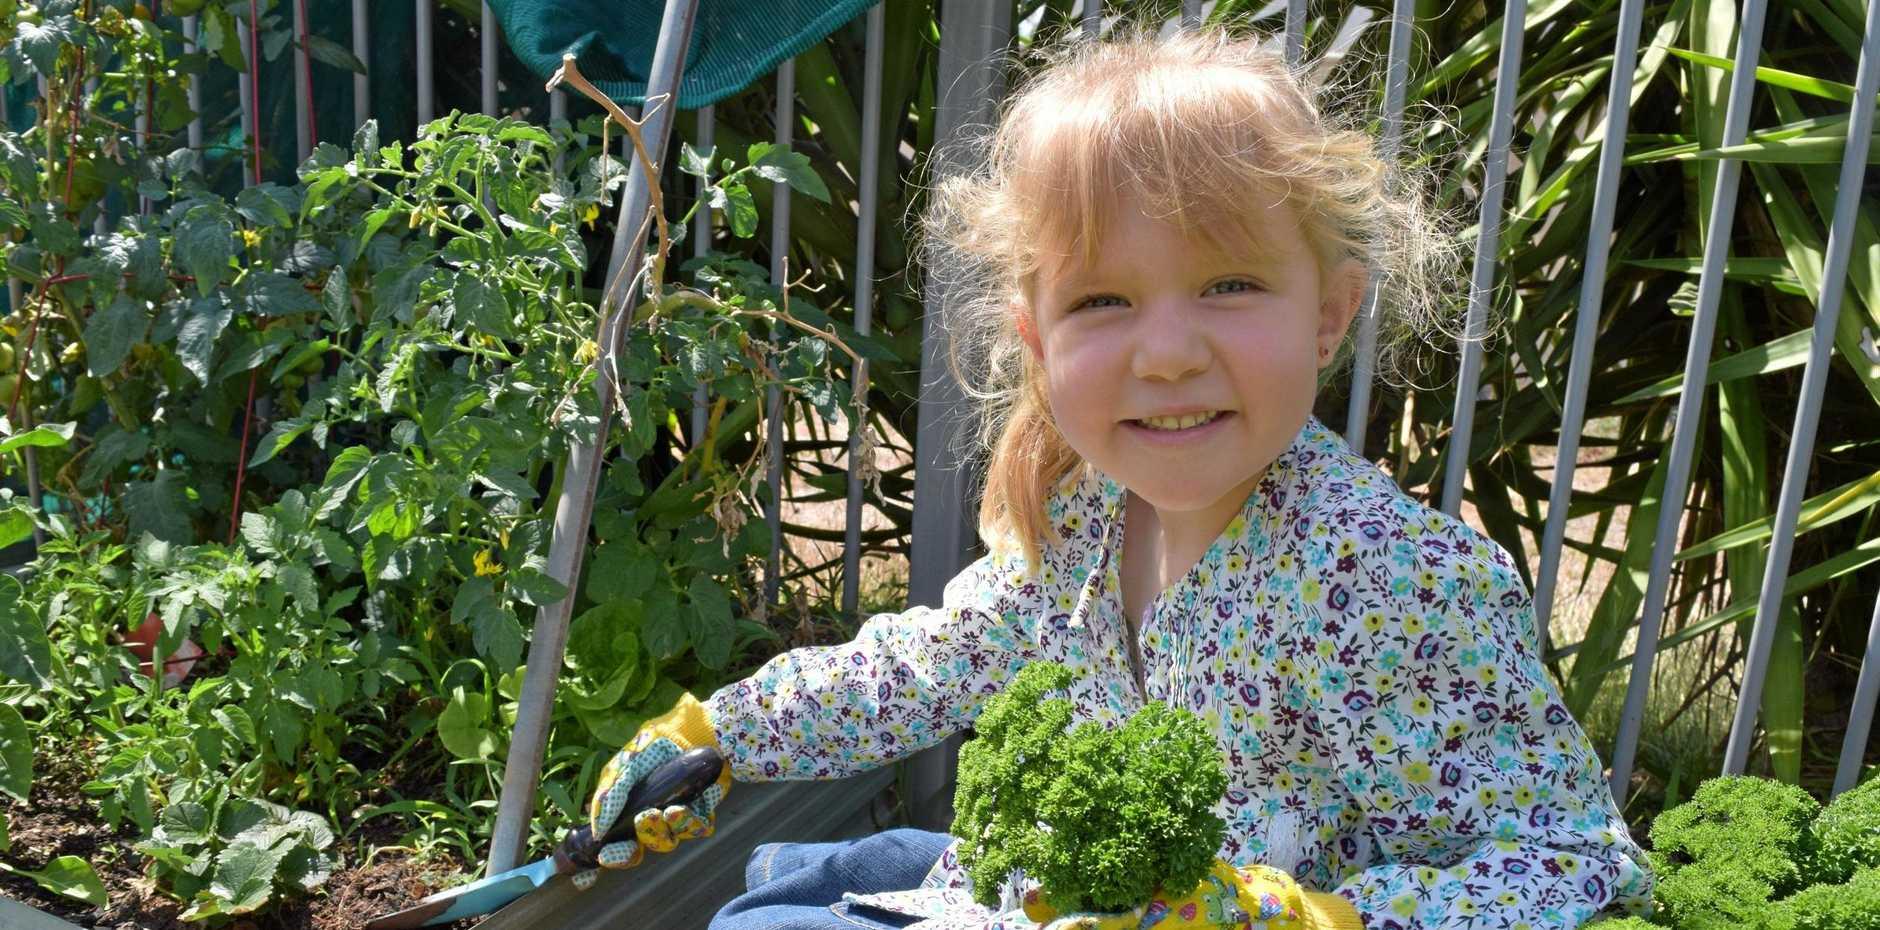 LITTLE GARDENER: Emerald's Isla Gilbert, 4, loves gardening and eating straight from her vegetable patch.